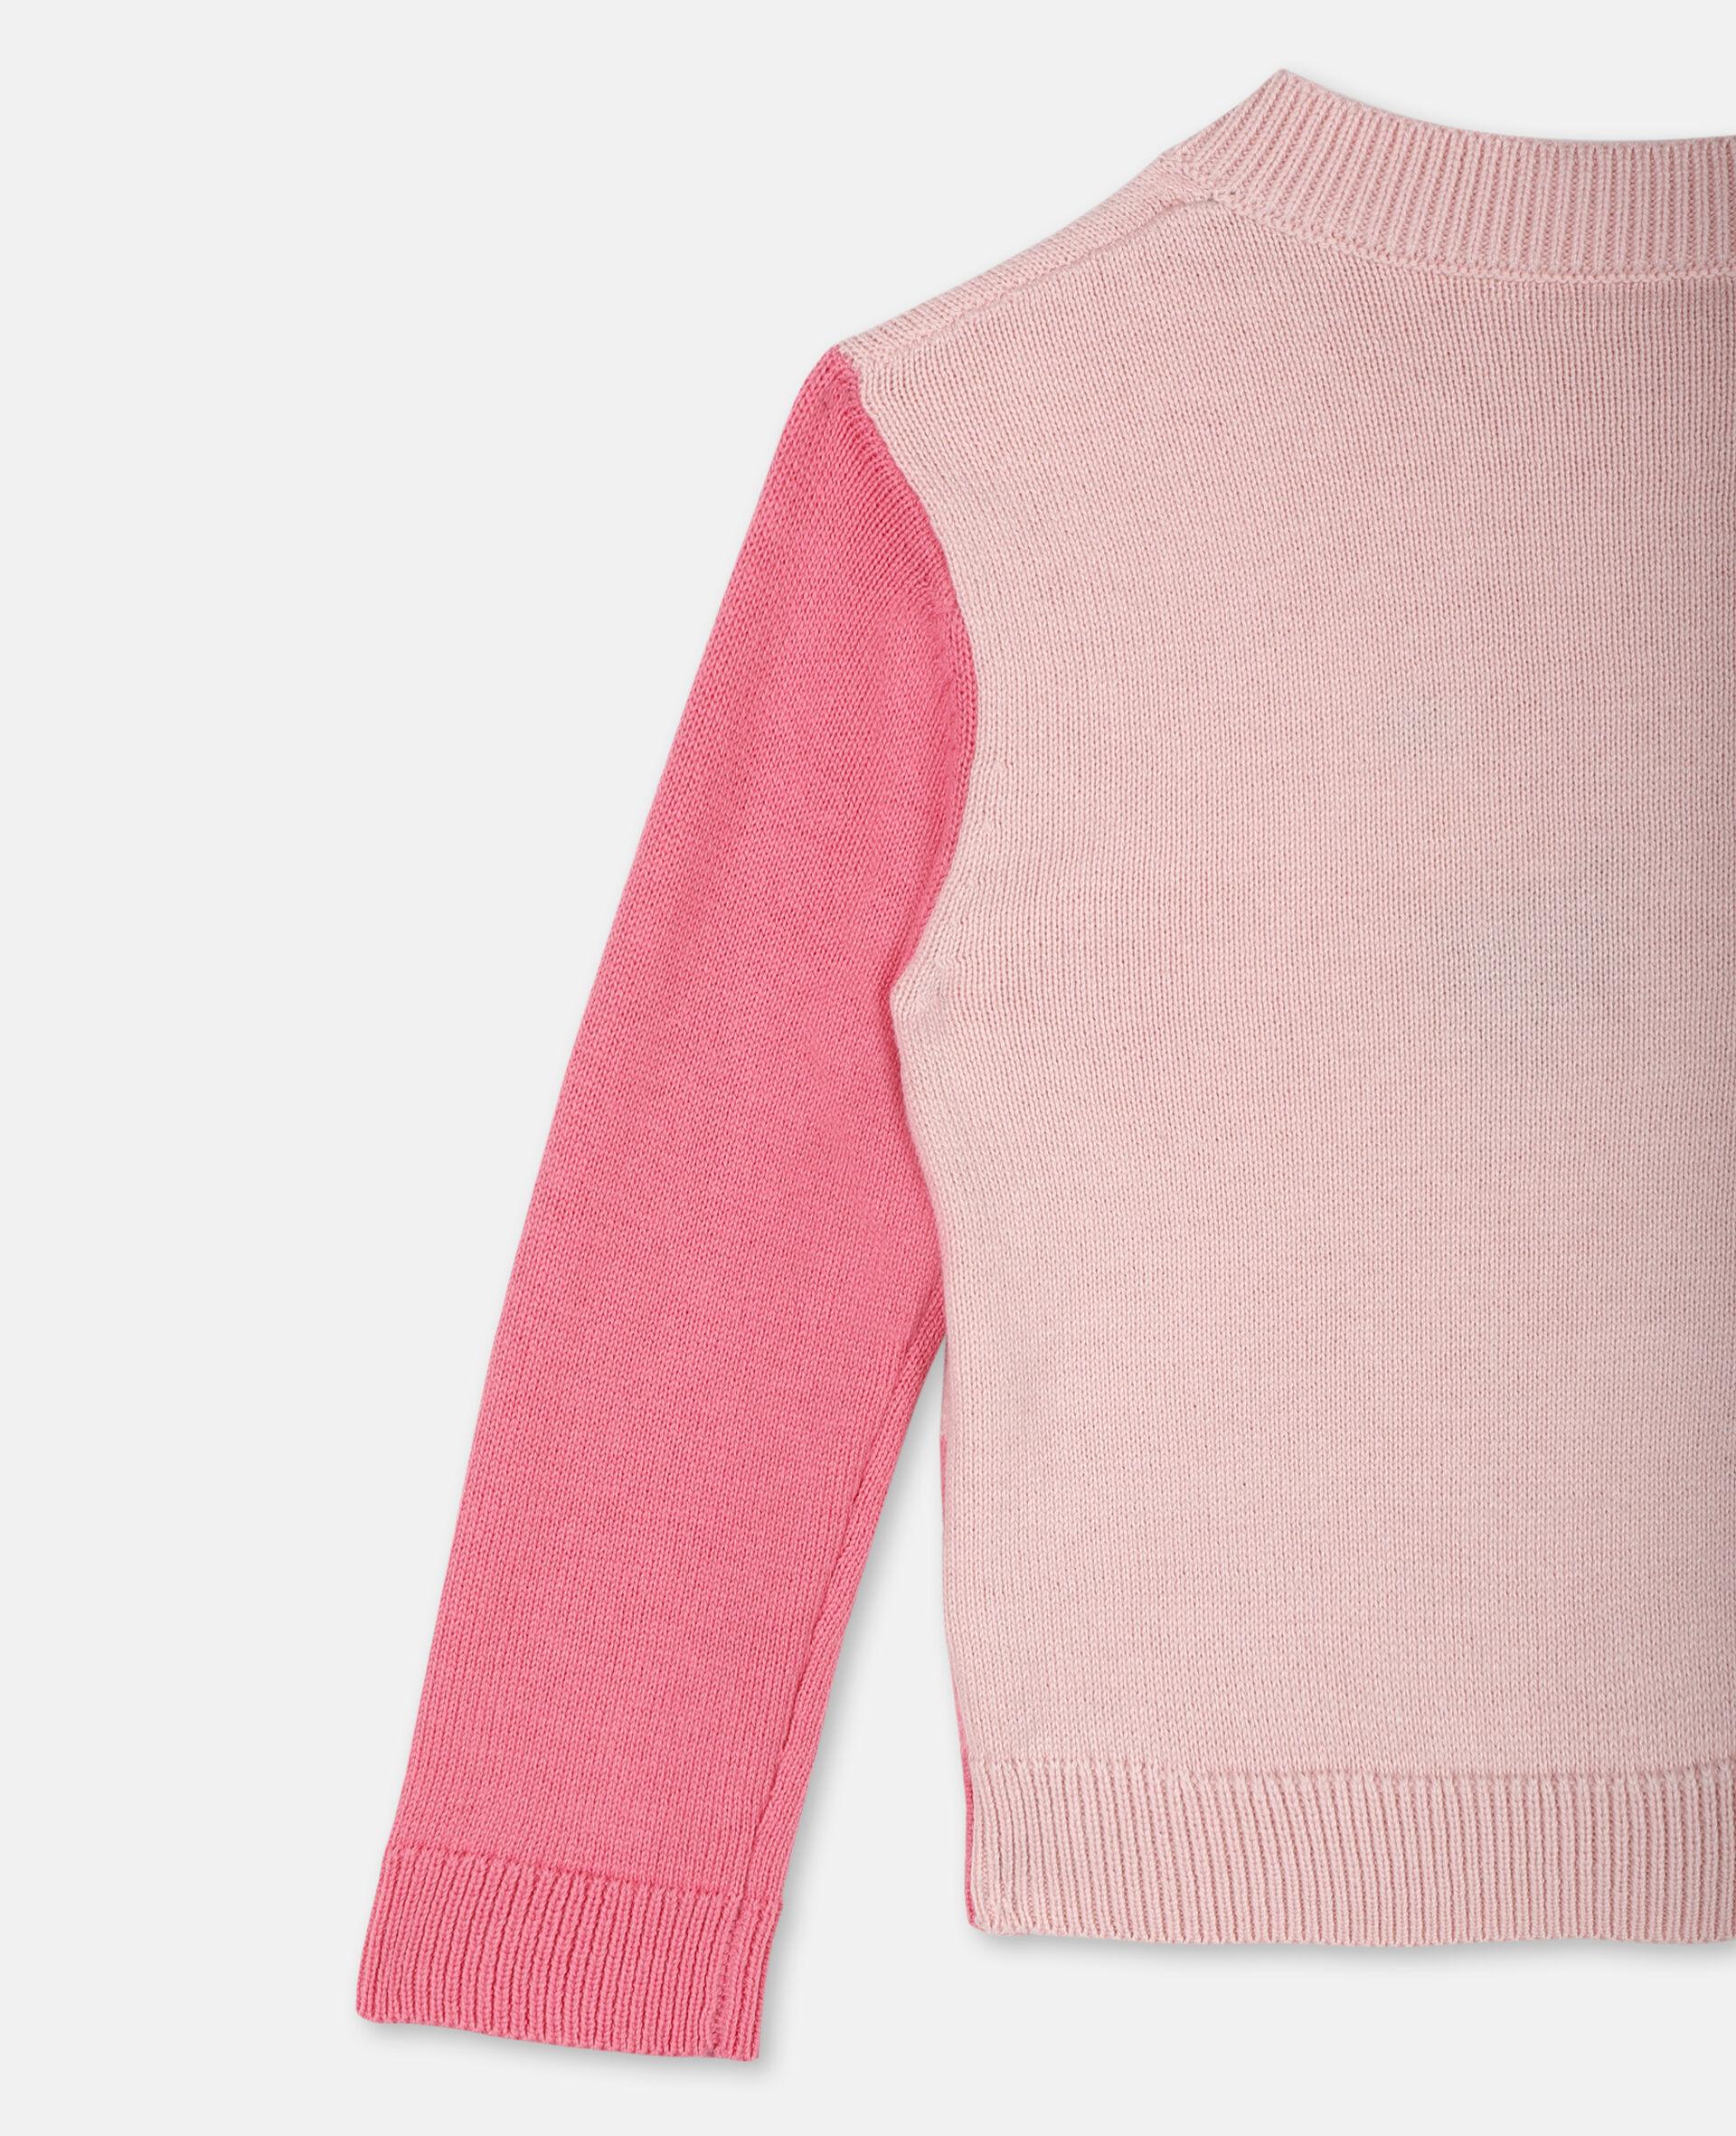 Flamingo 嵌花针织棉质开衫 -粉色-large image number 2